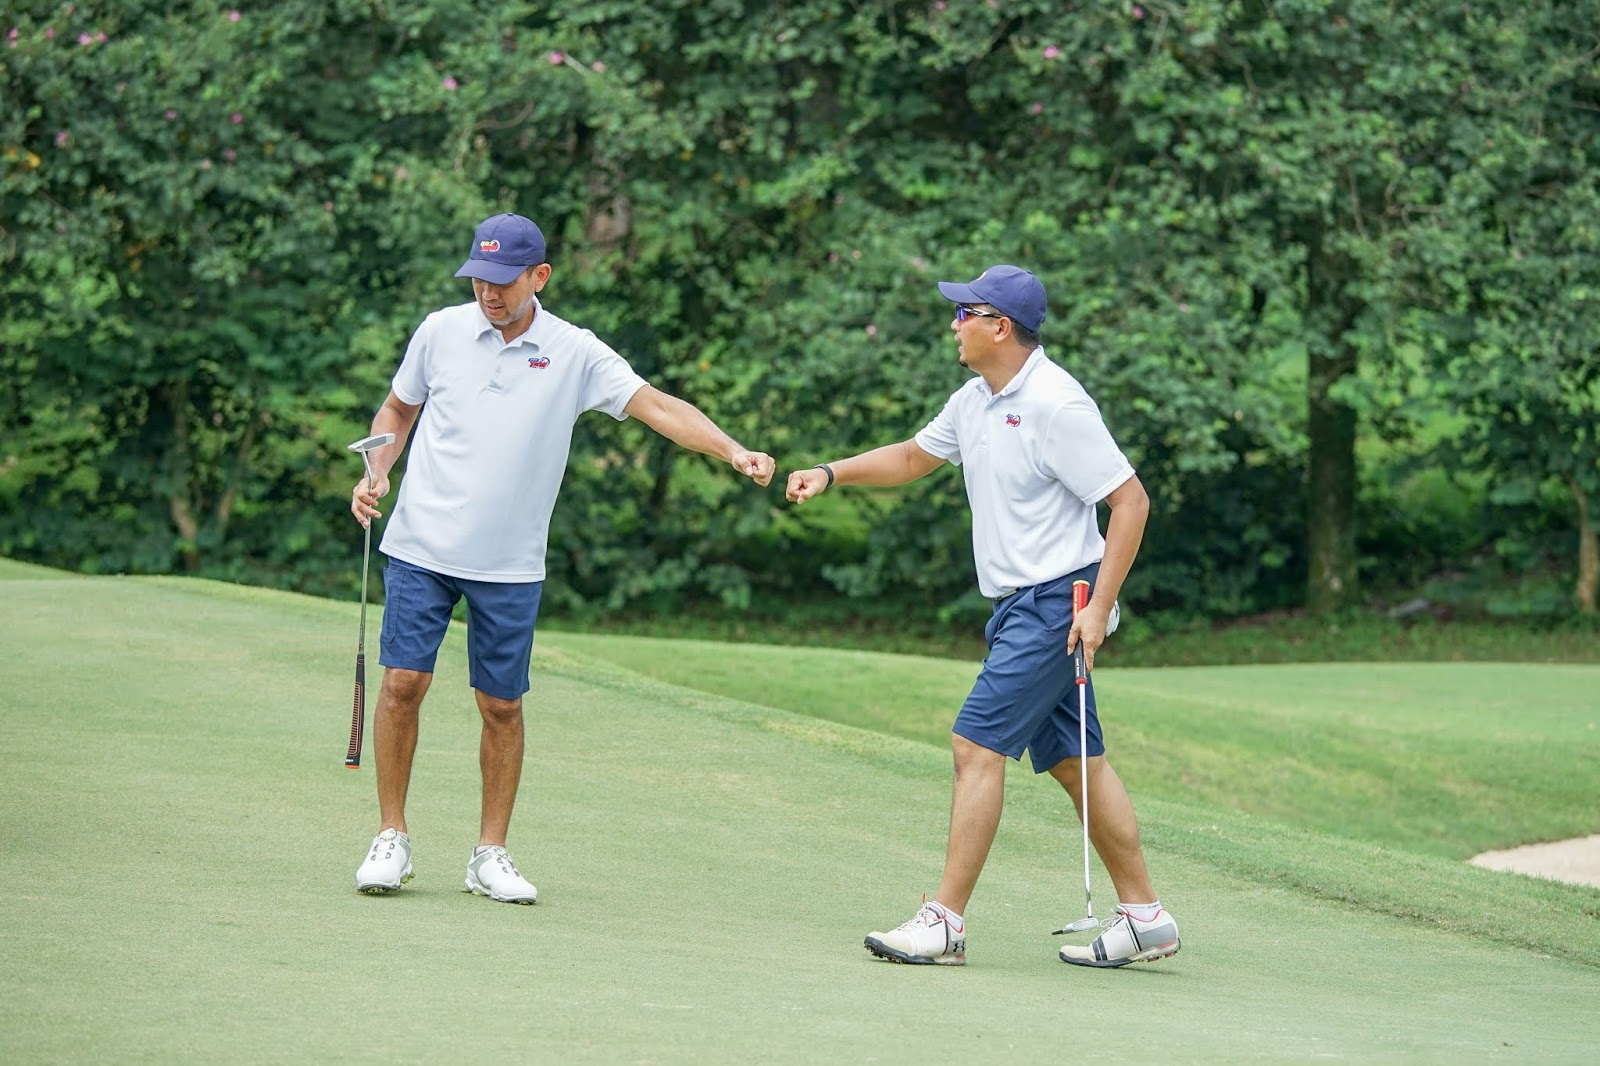 Lomba Golf, Golf Competition, Pertandingan Golf Kelas Pemula, Golf Untuk Millenial